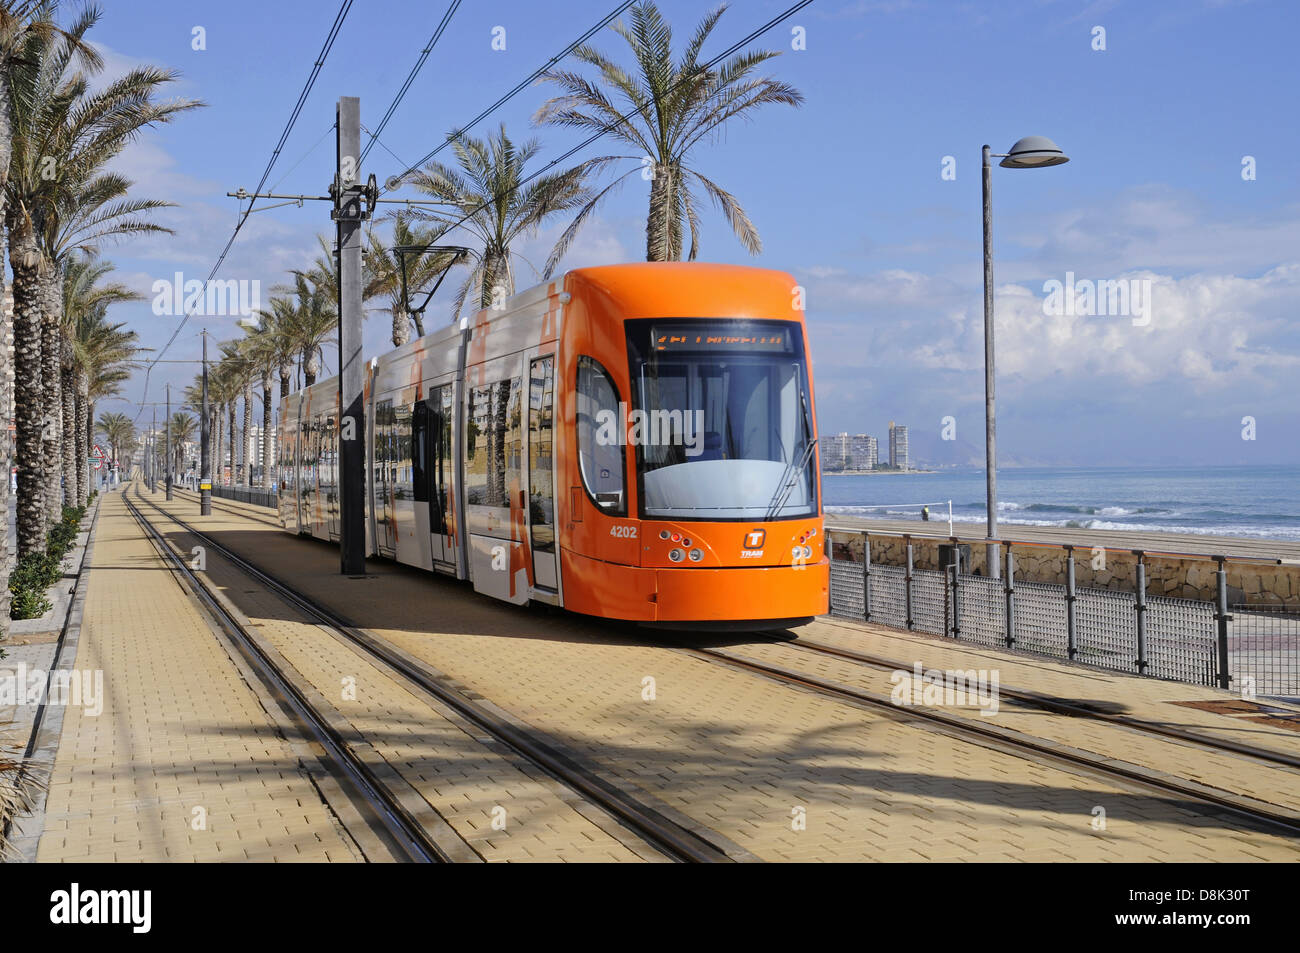 Streetcar - Stock Image